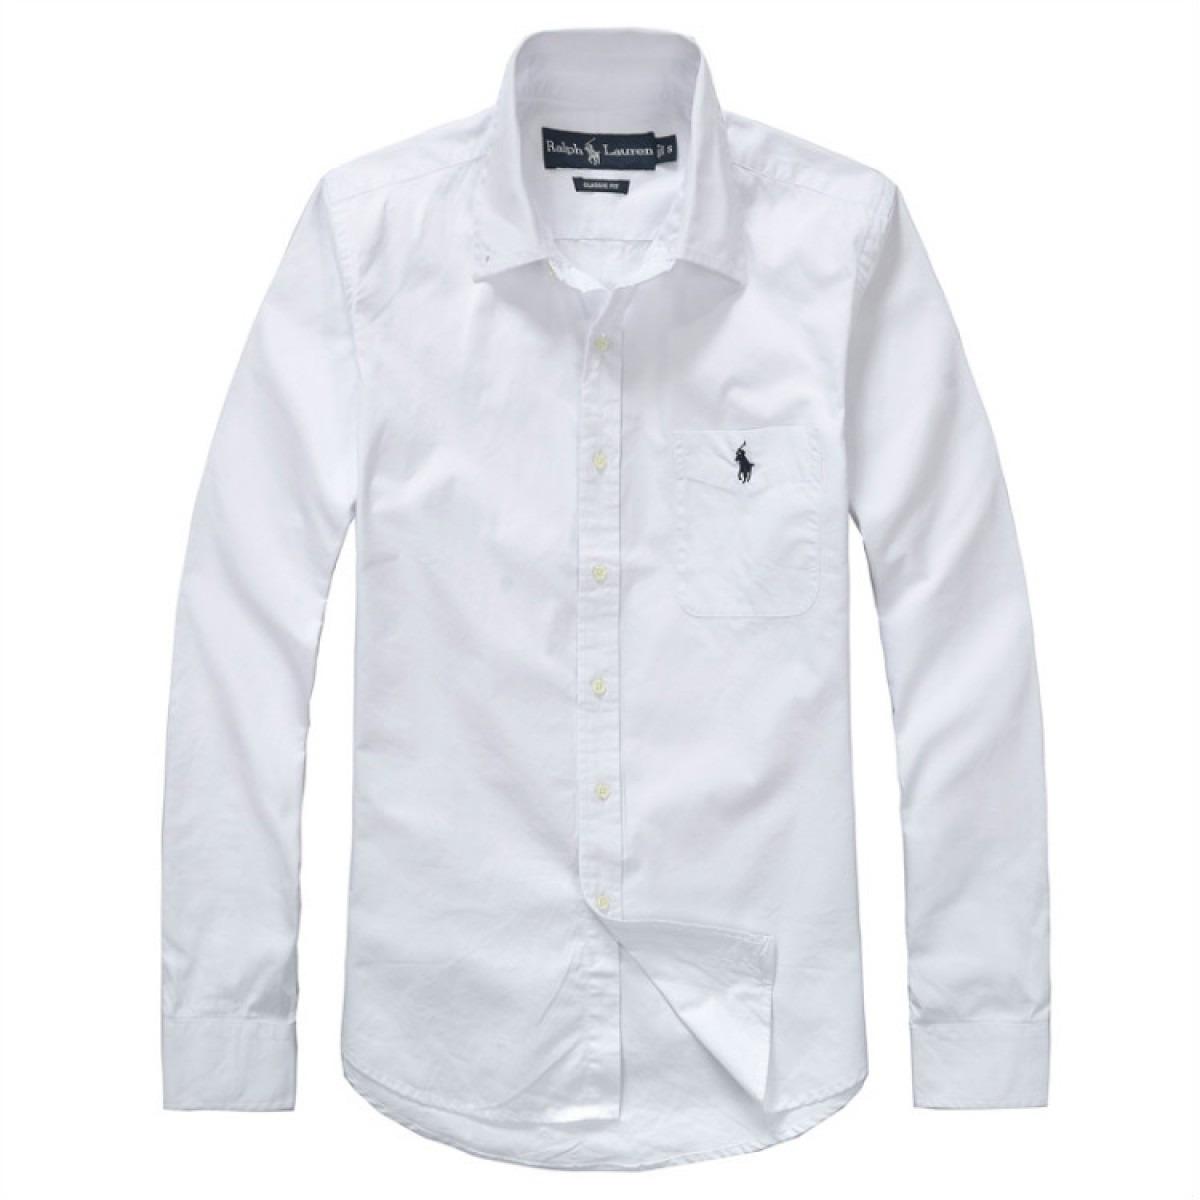 229661fa1e8c2 camisa ralph lauren polo original manga larga hombre y dama · camisa manga  larga hombre. Cargando zoom.